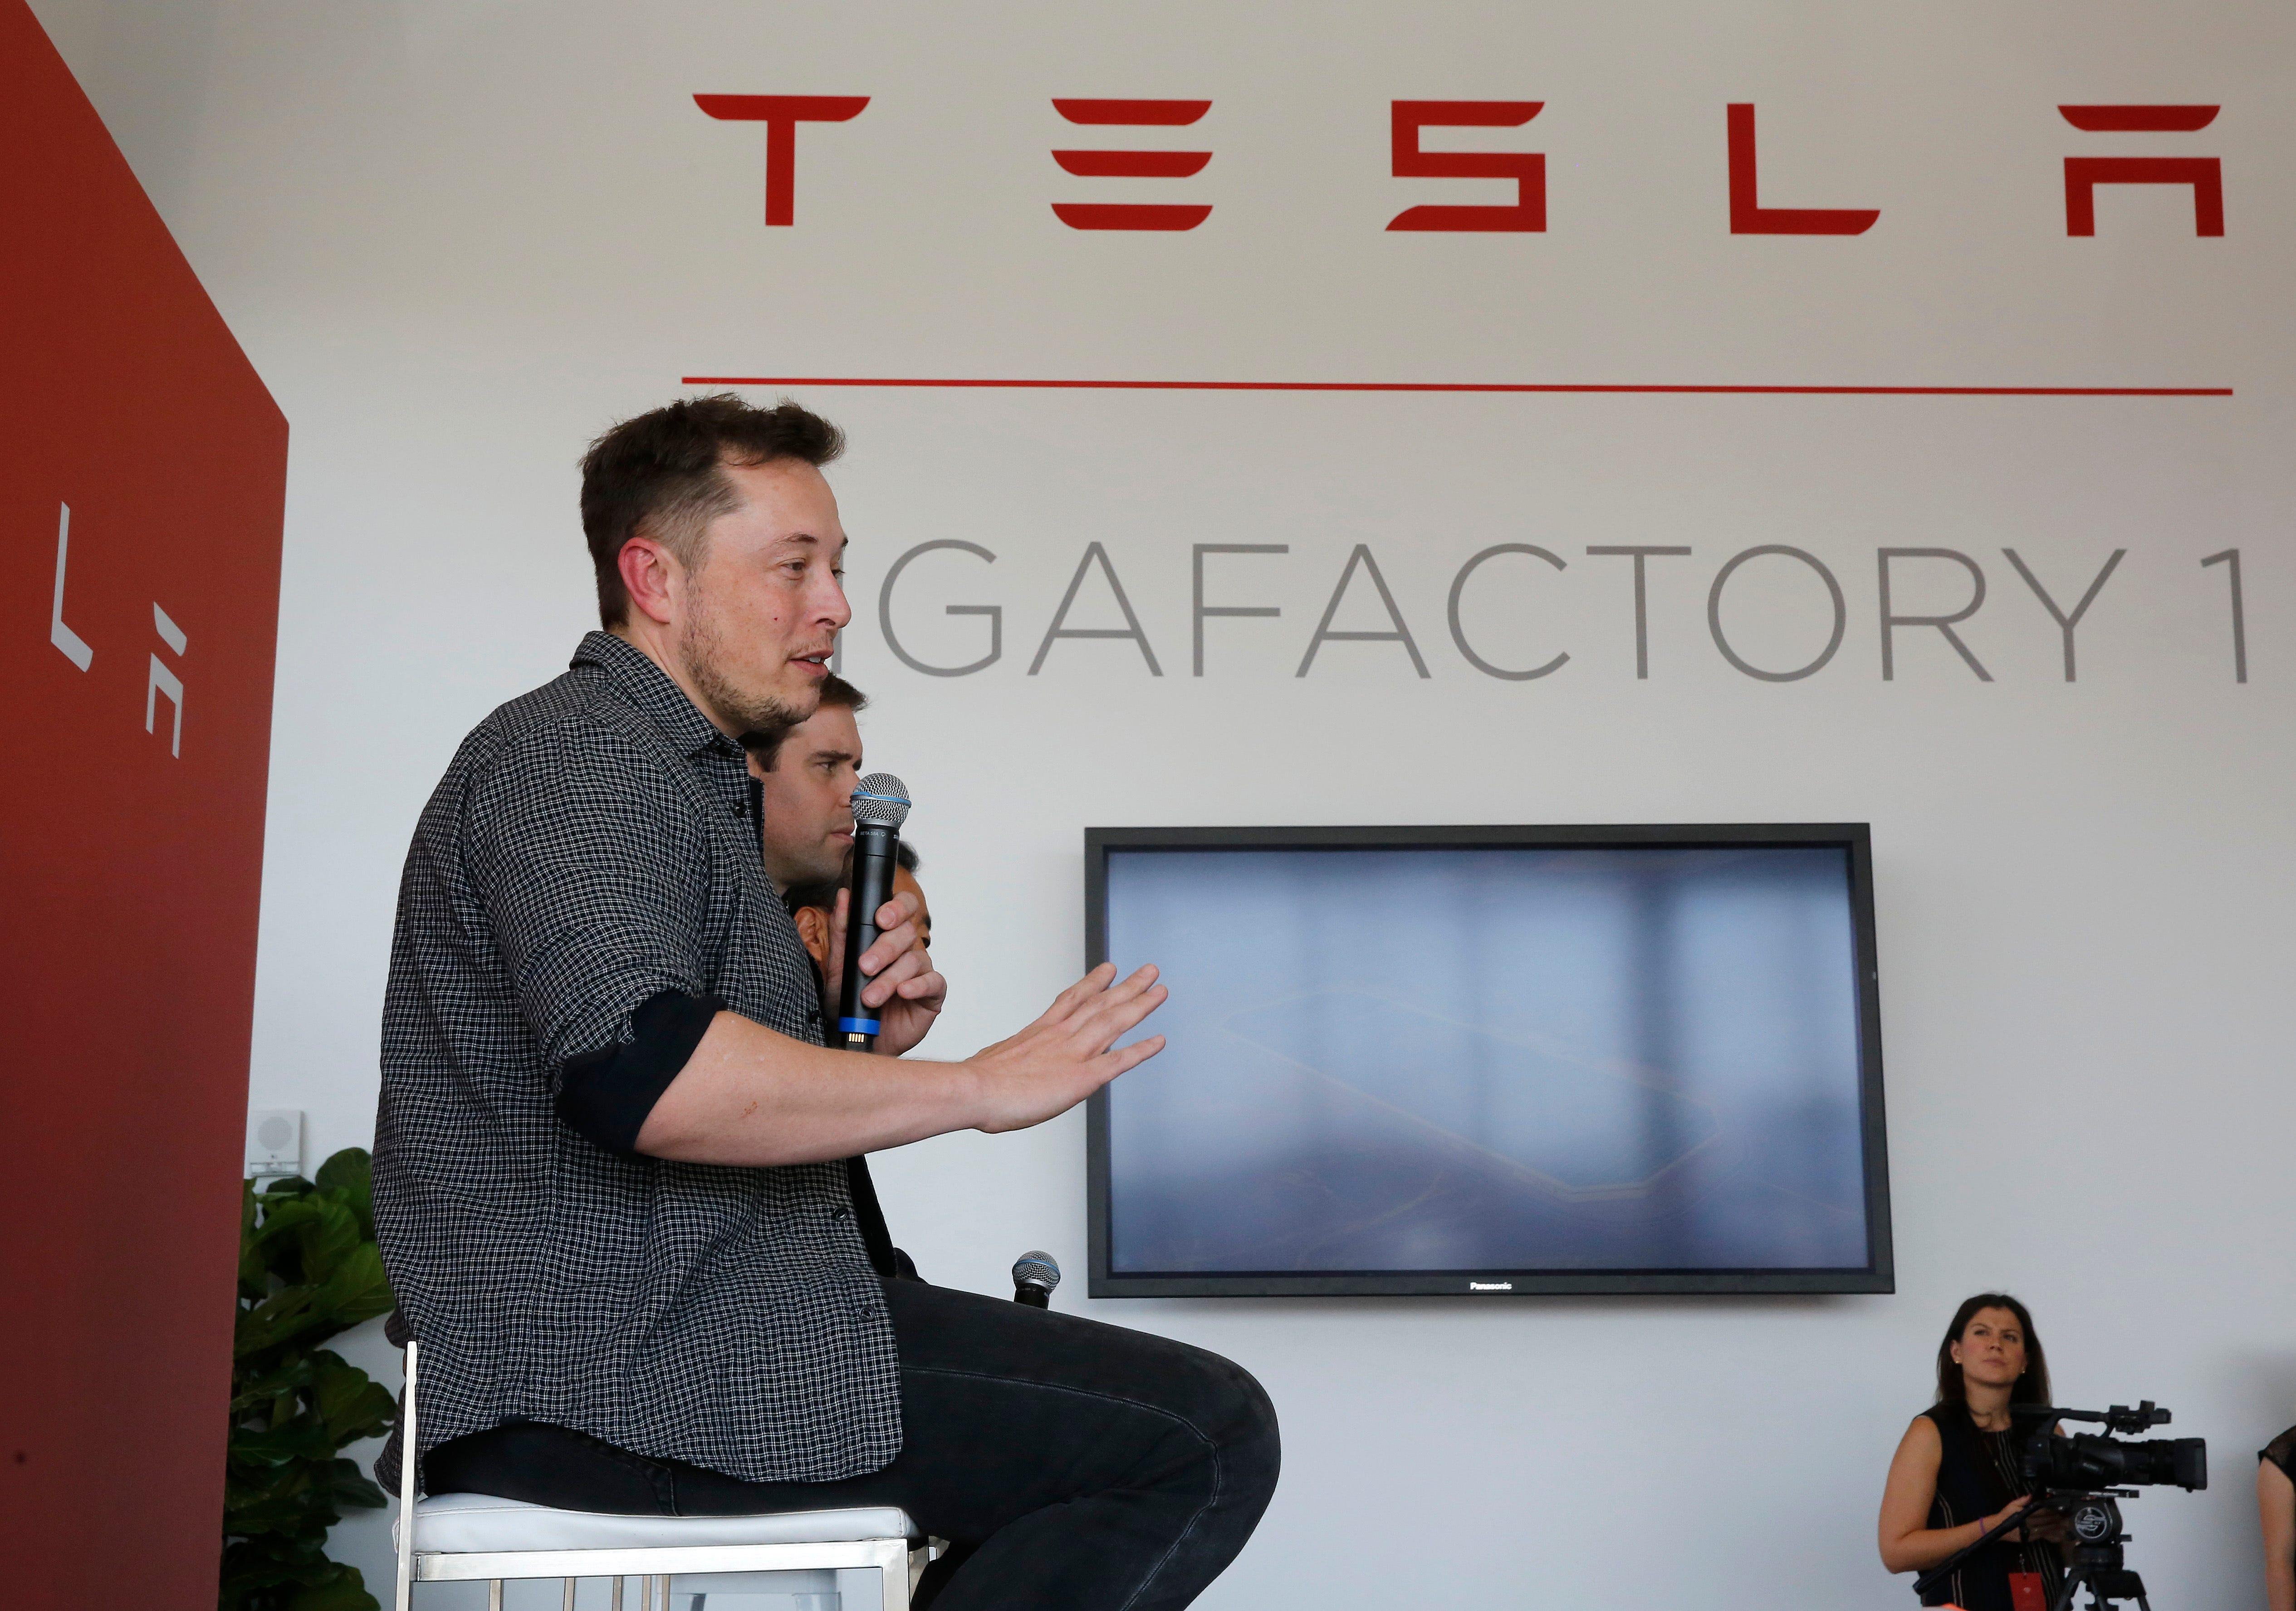 Tesla whistleblower claims rampant theft, drug dealing at Nevada Gigafactory